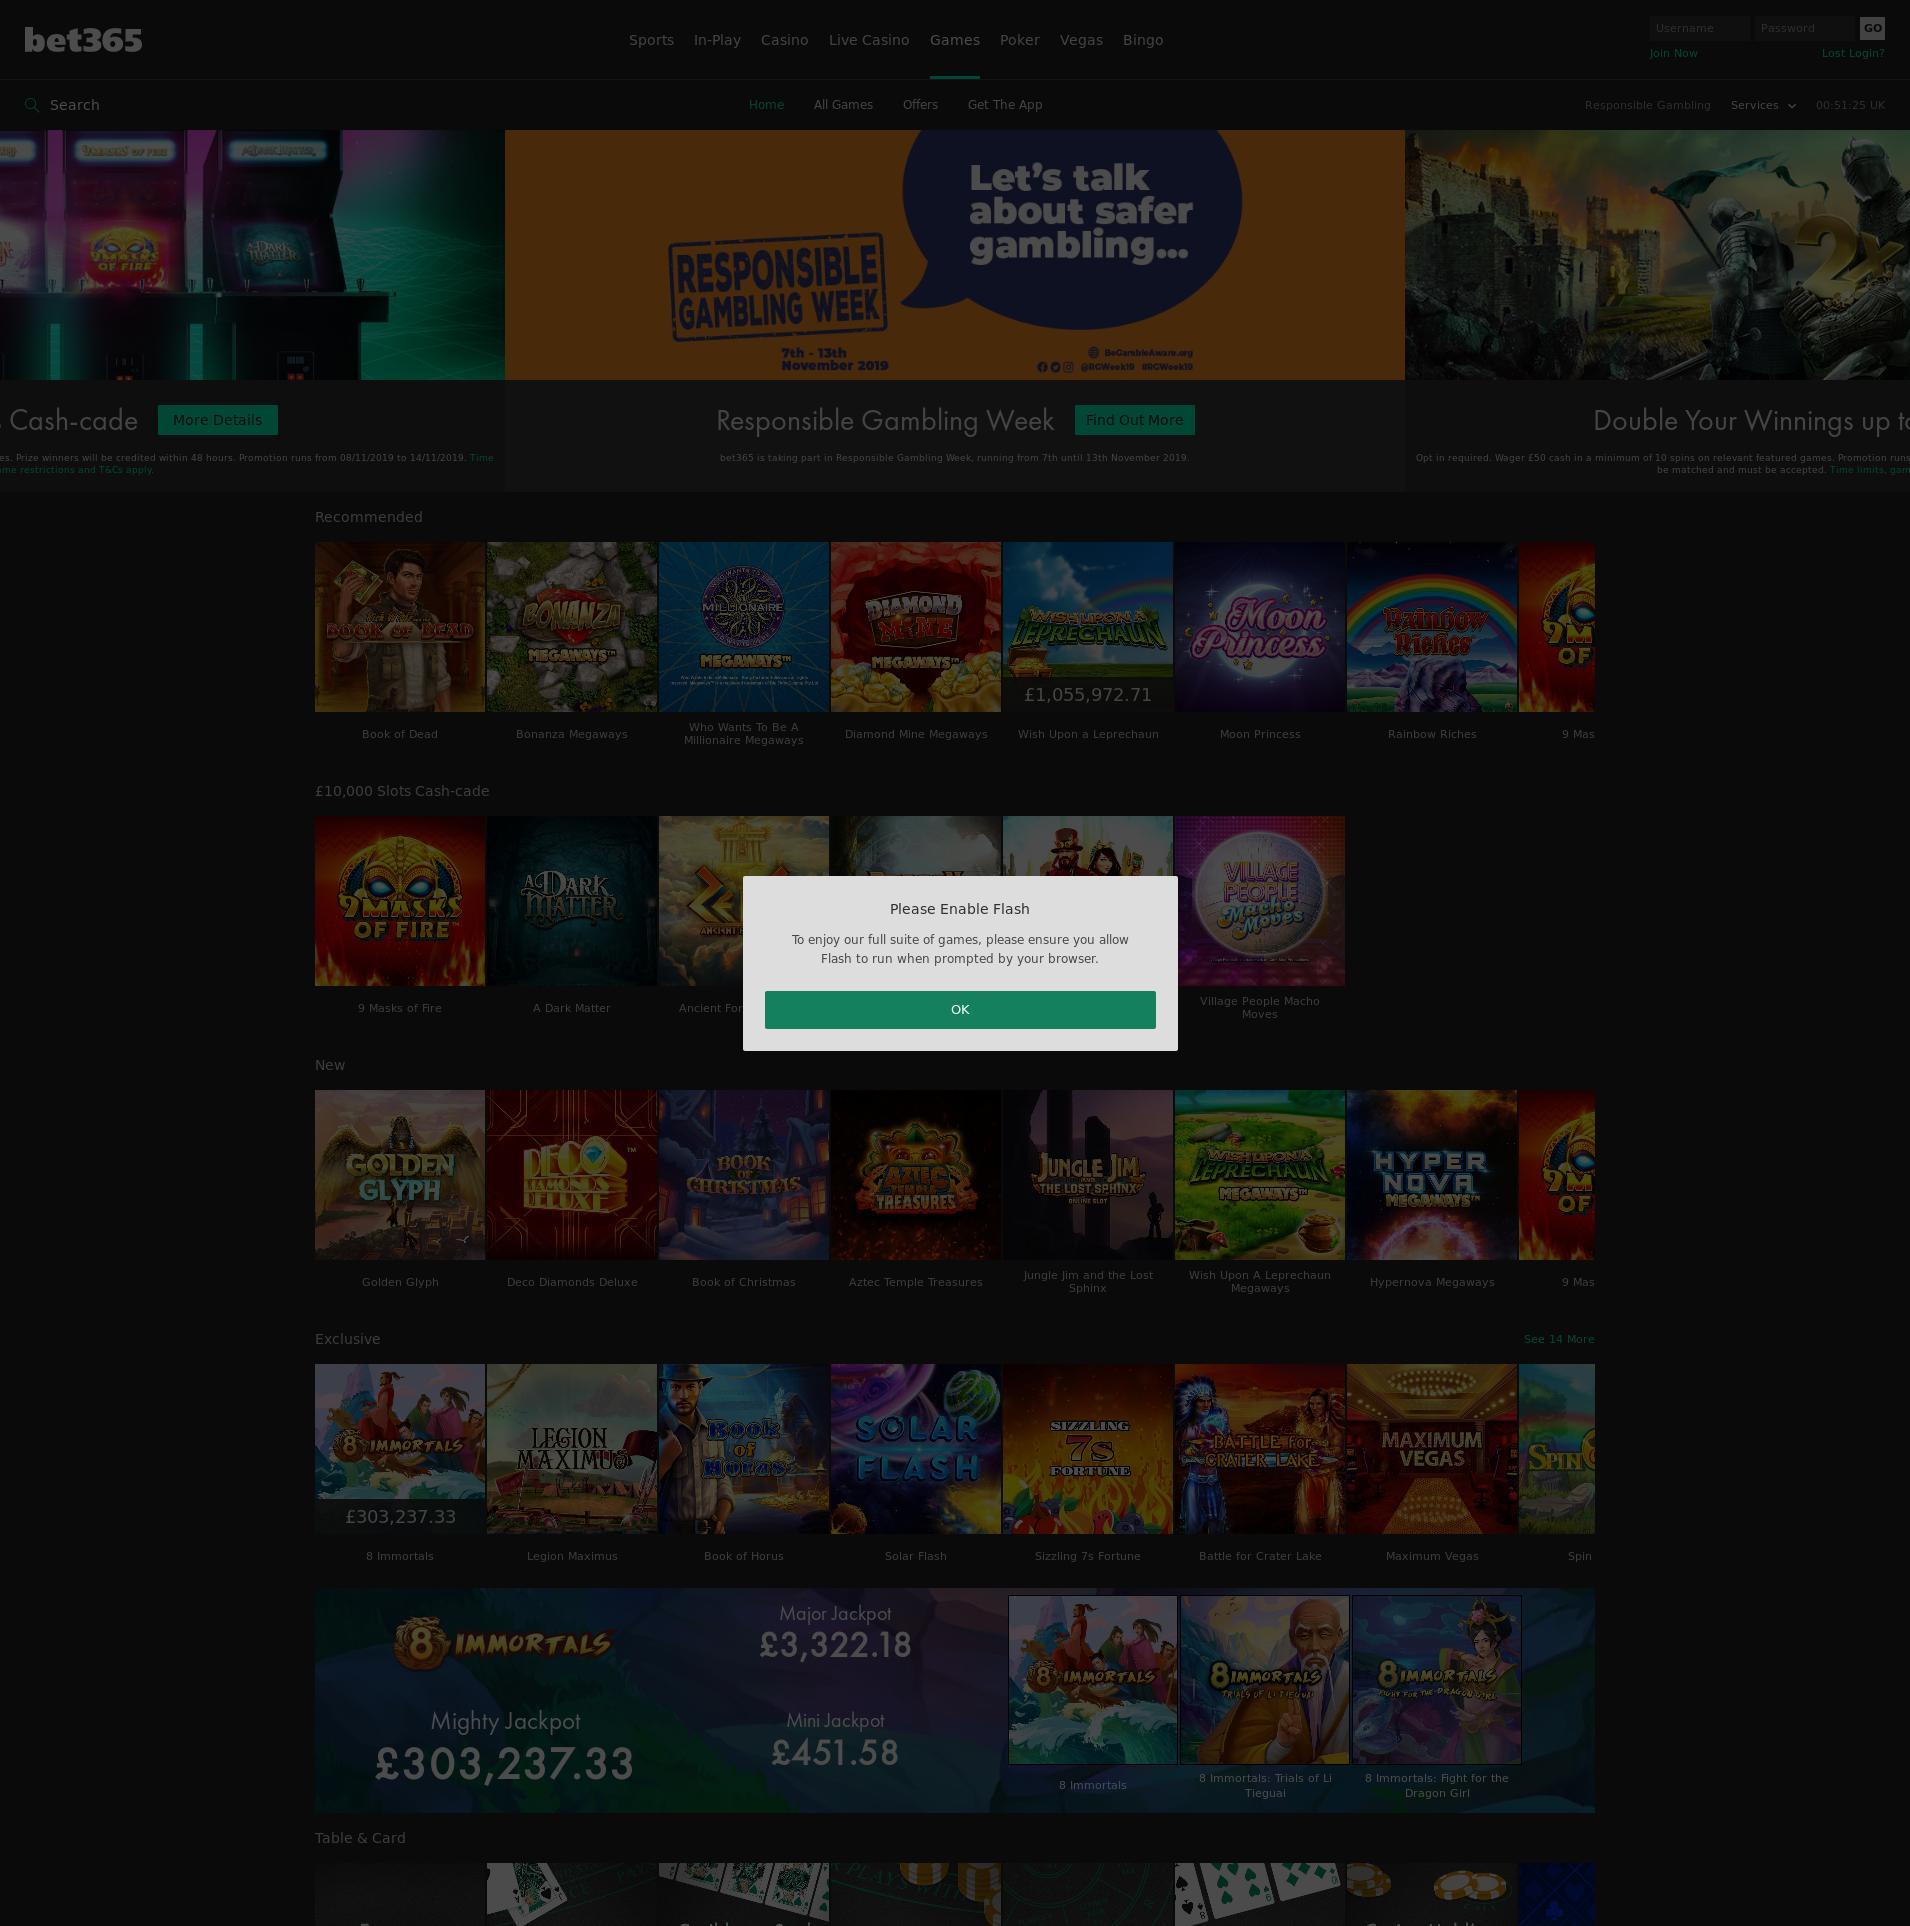 Casino screen Lobby 2019-11-13 for United Kingdom